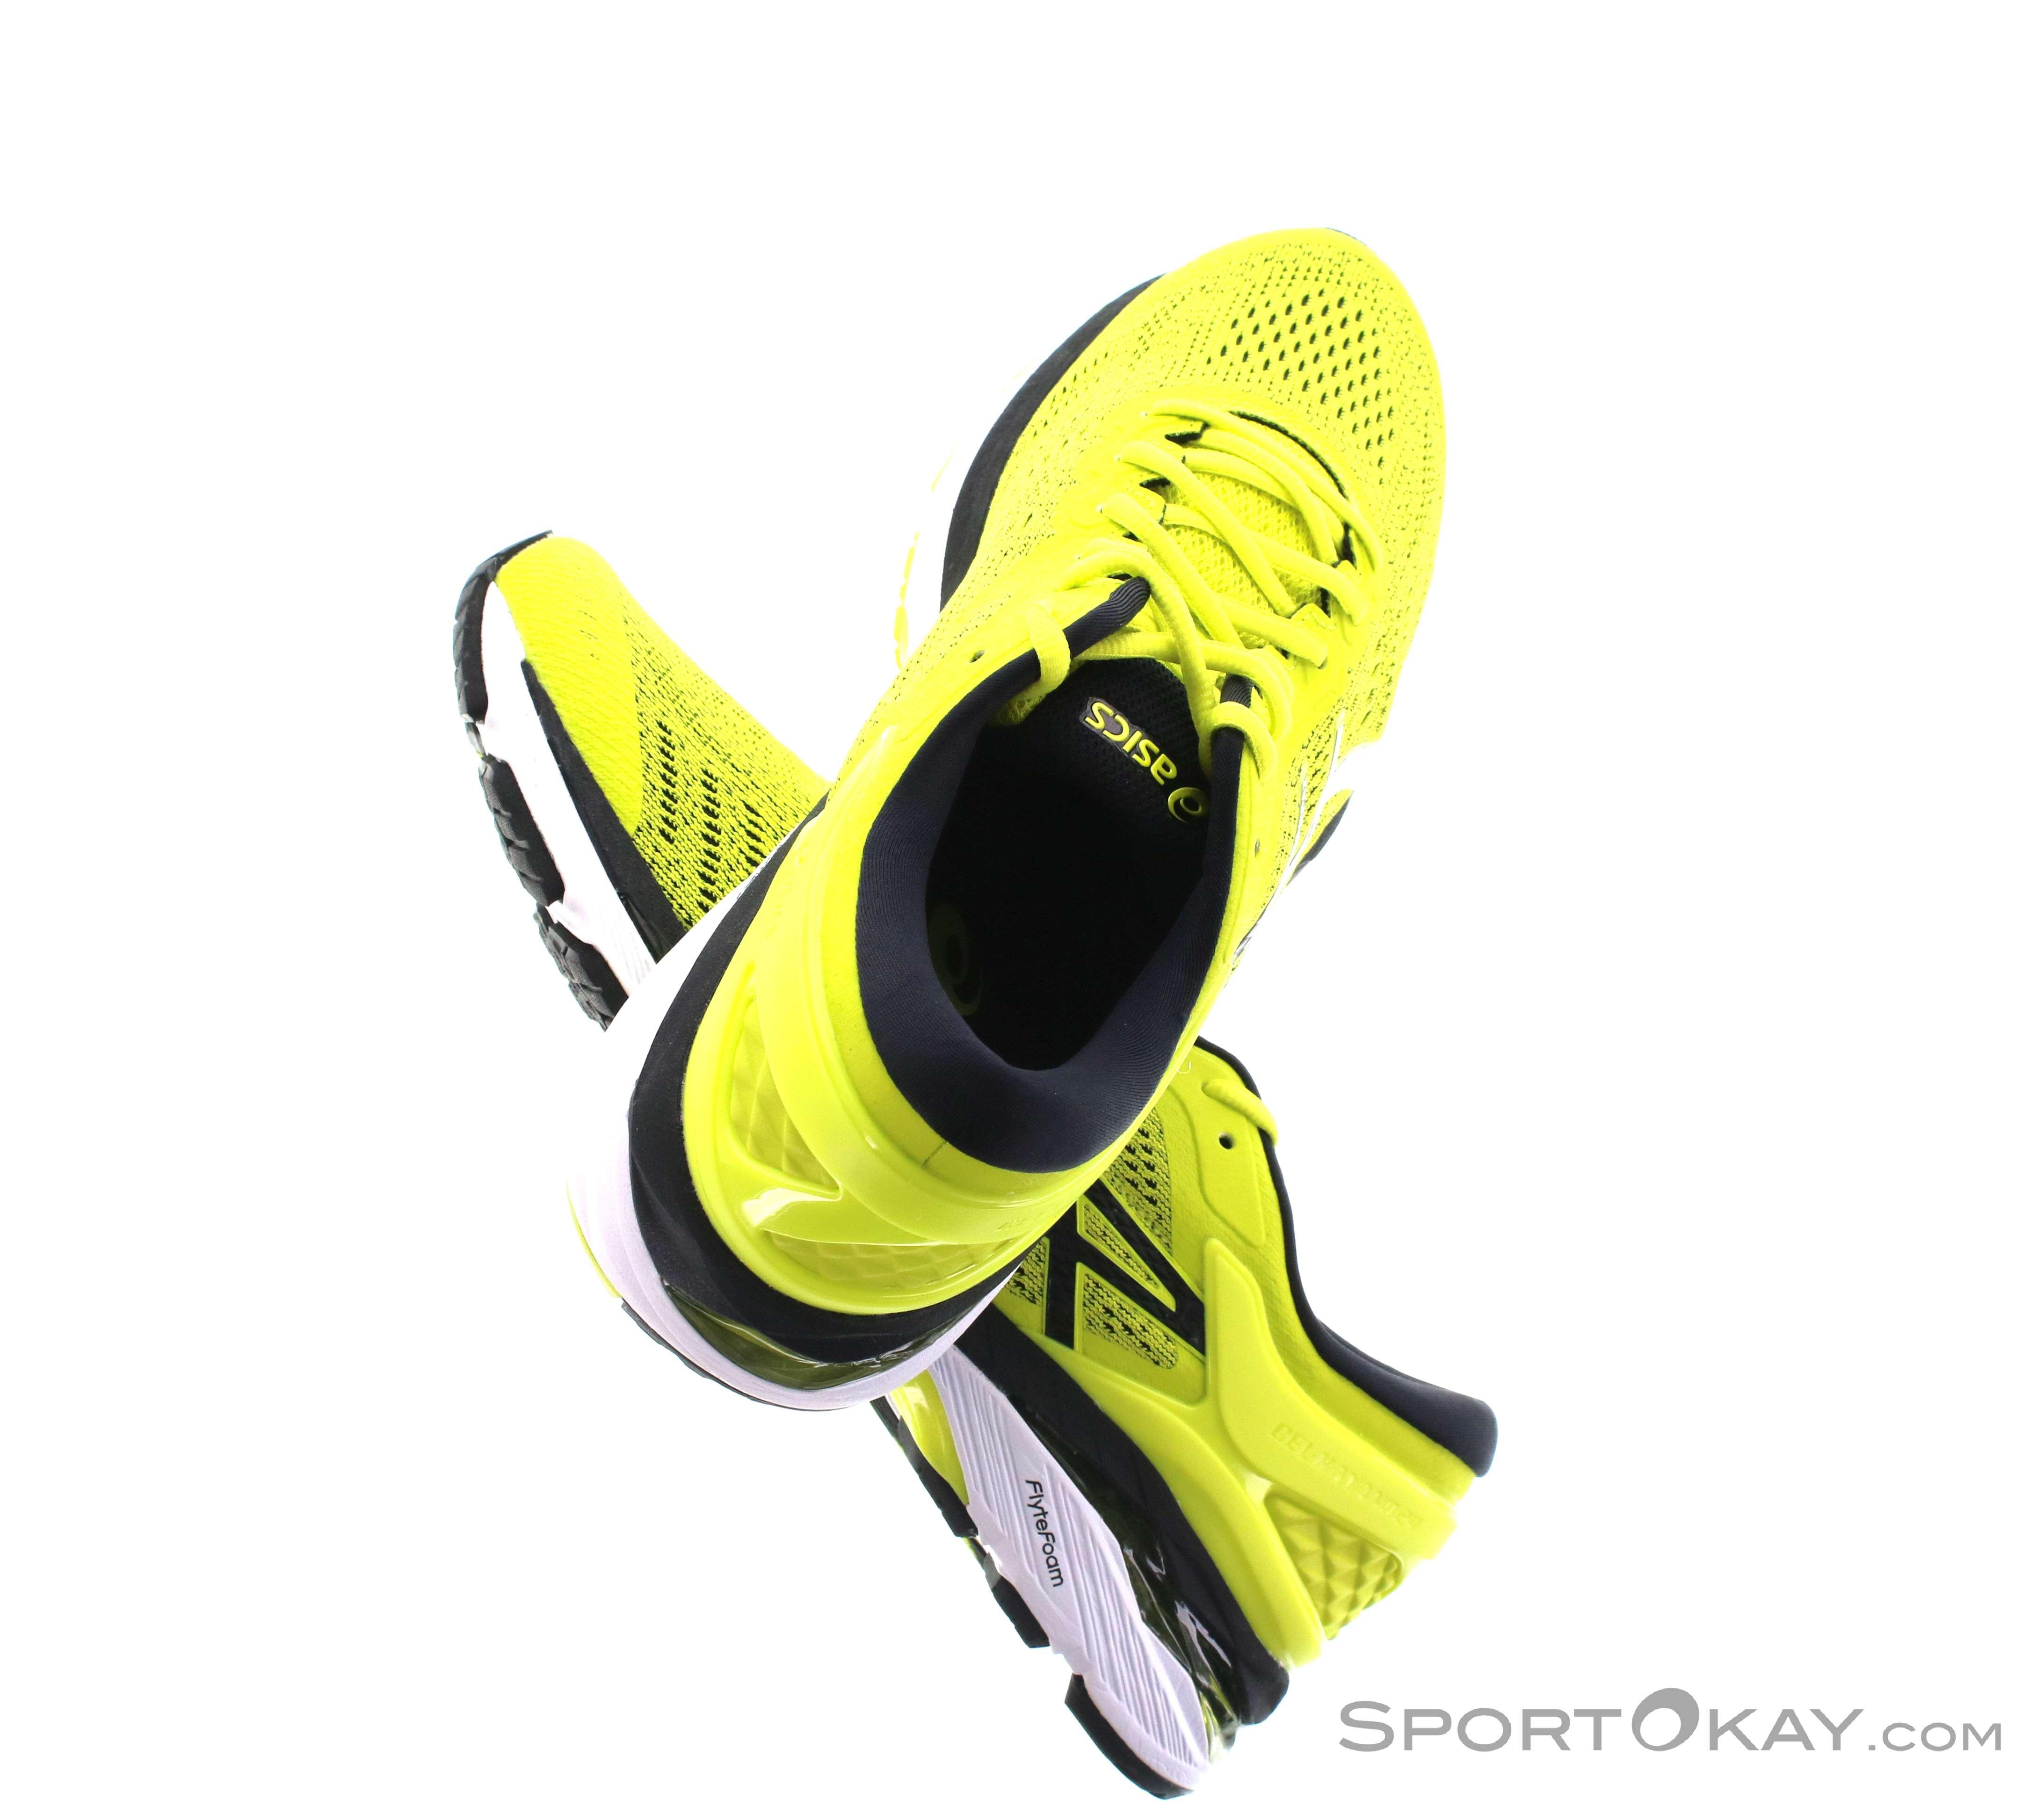 Asics Asics Kayano 24 Mens Running Shoes